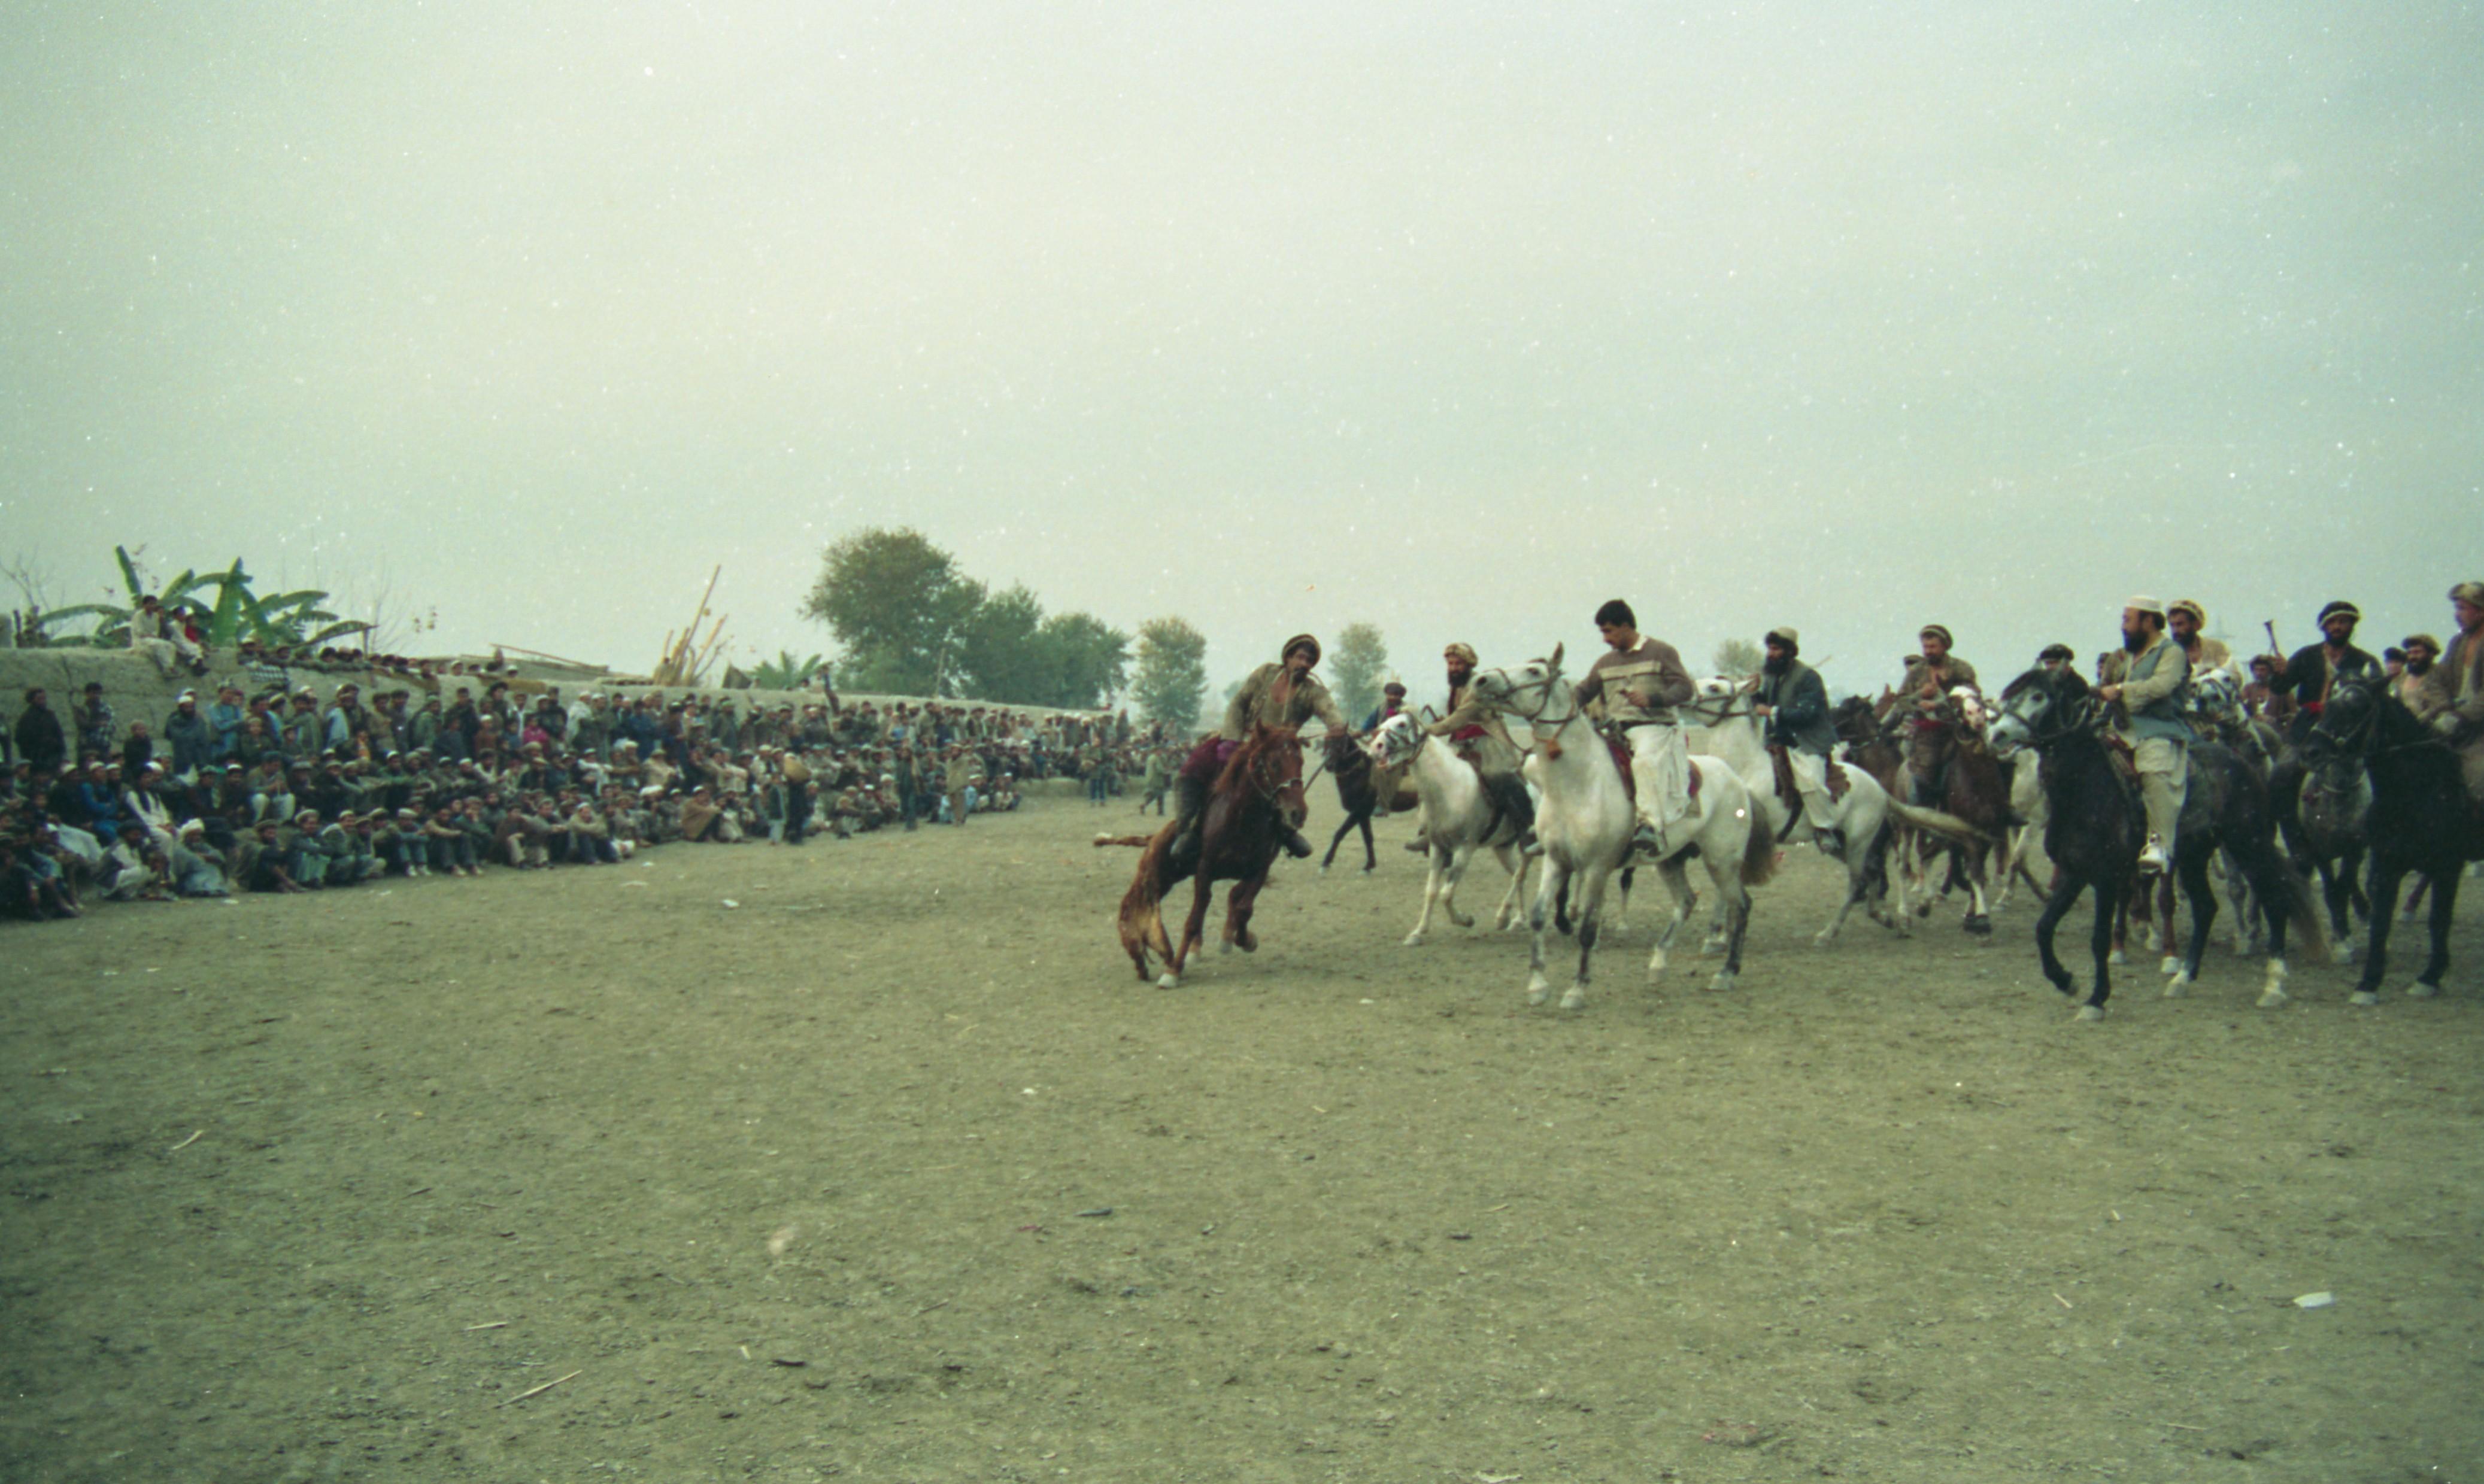 Afghan refugees playing Buzkashī (Goat grabbing) game  : Ahmad Shah